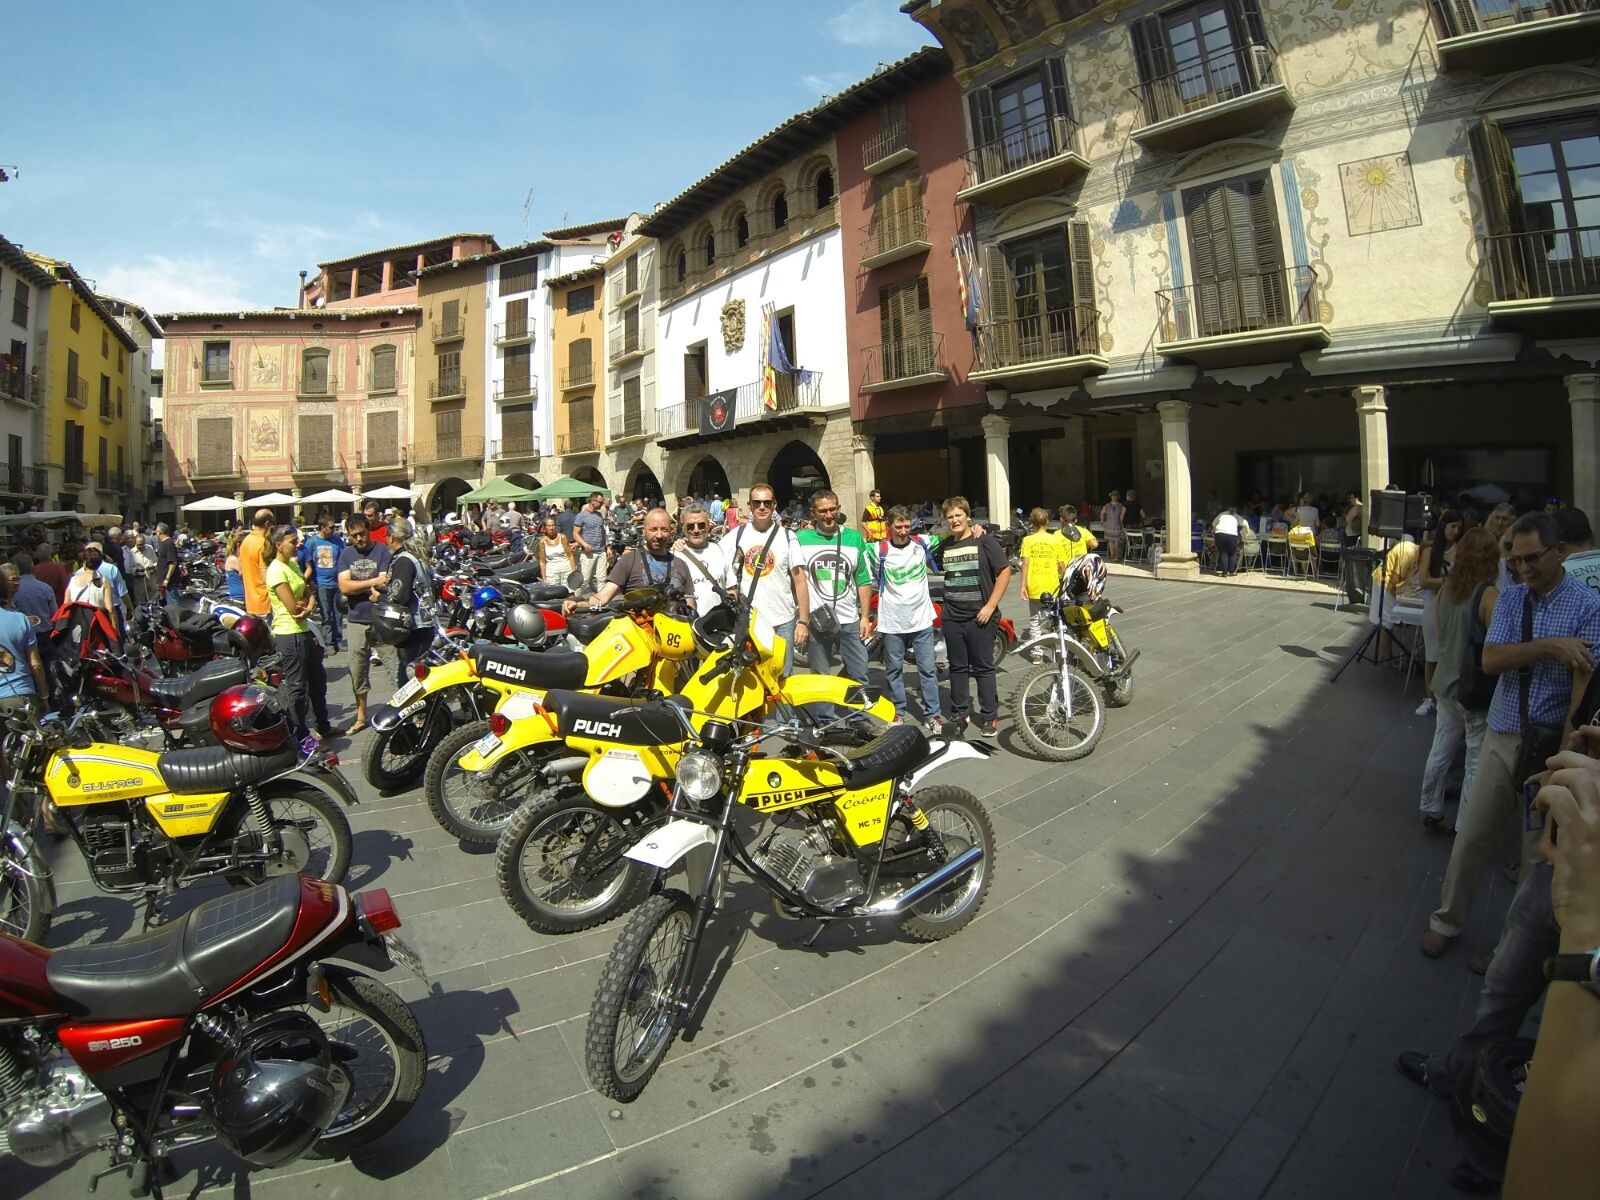 XI concentracion de motos antiguas en Alberuela de tubo (Huesca) 21lpso5